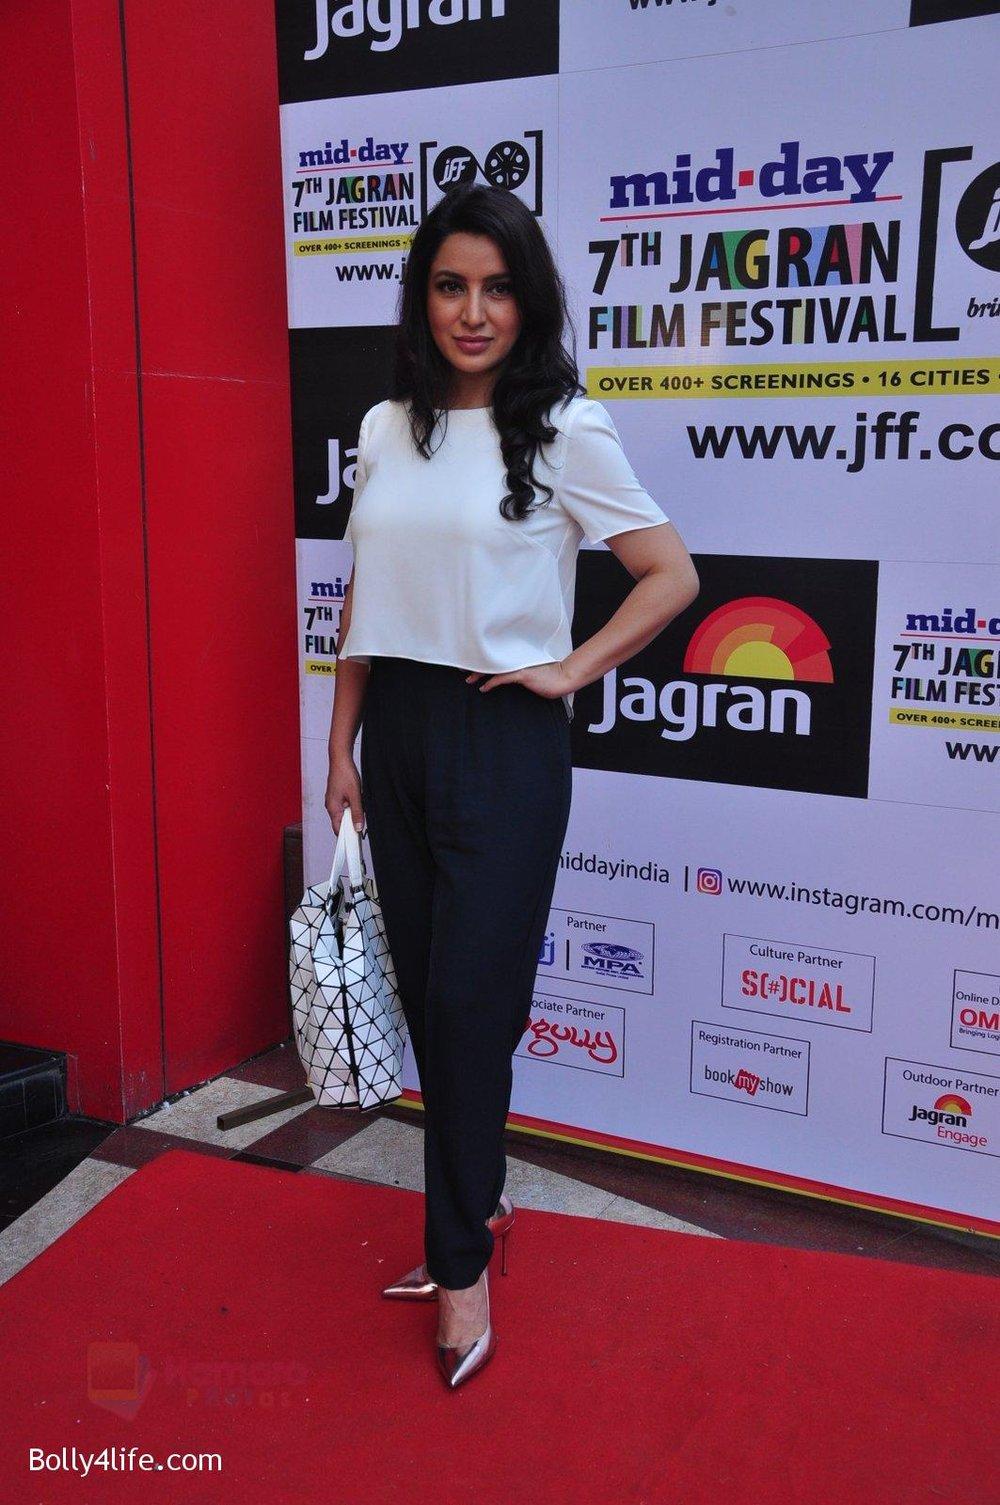 Tisca-Chopra-at-Jagran-Film-fest-screening-on-30th-Sept-2016-10.jpg